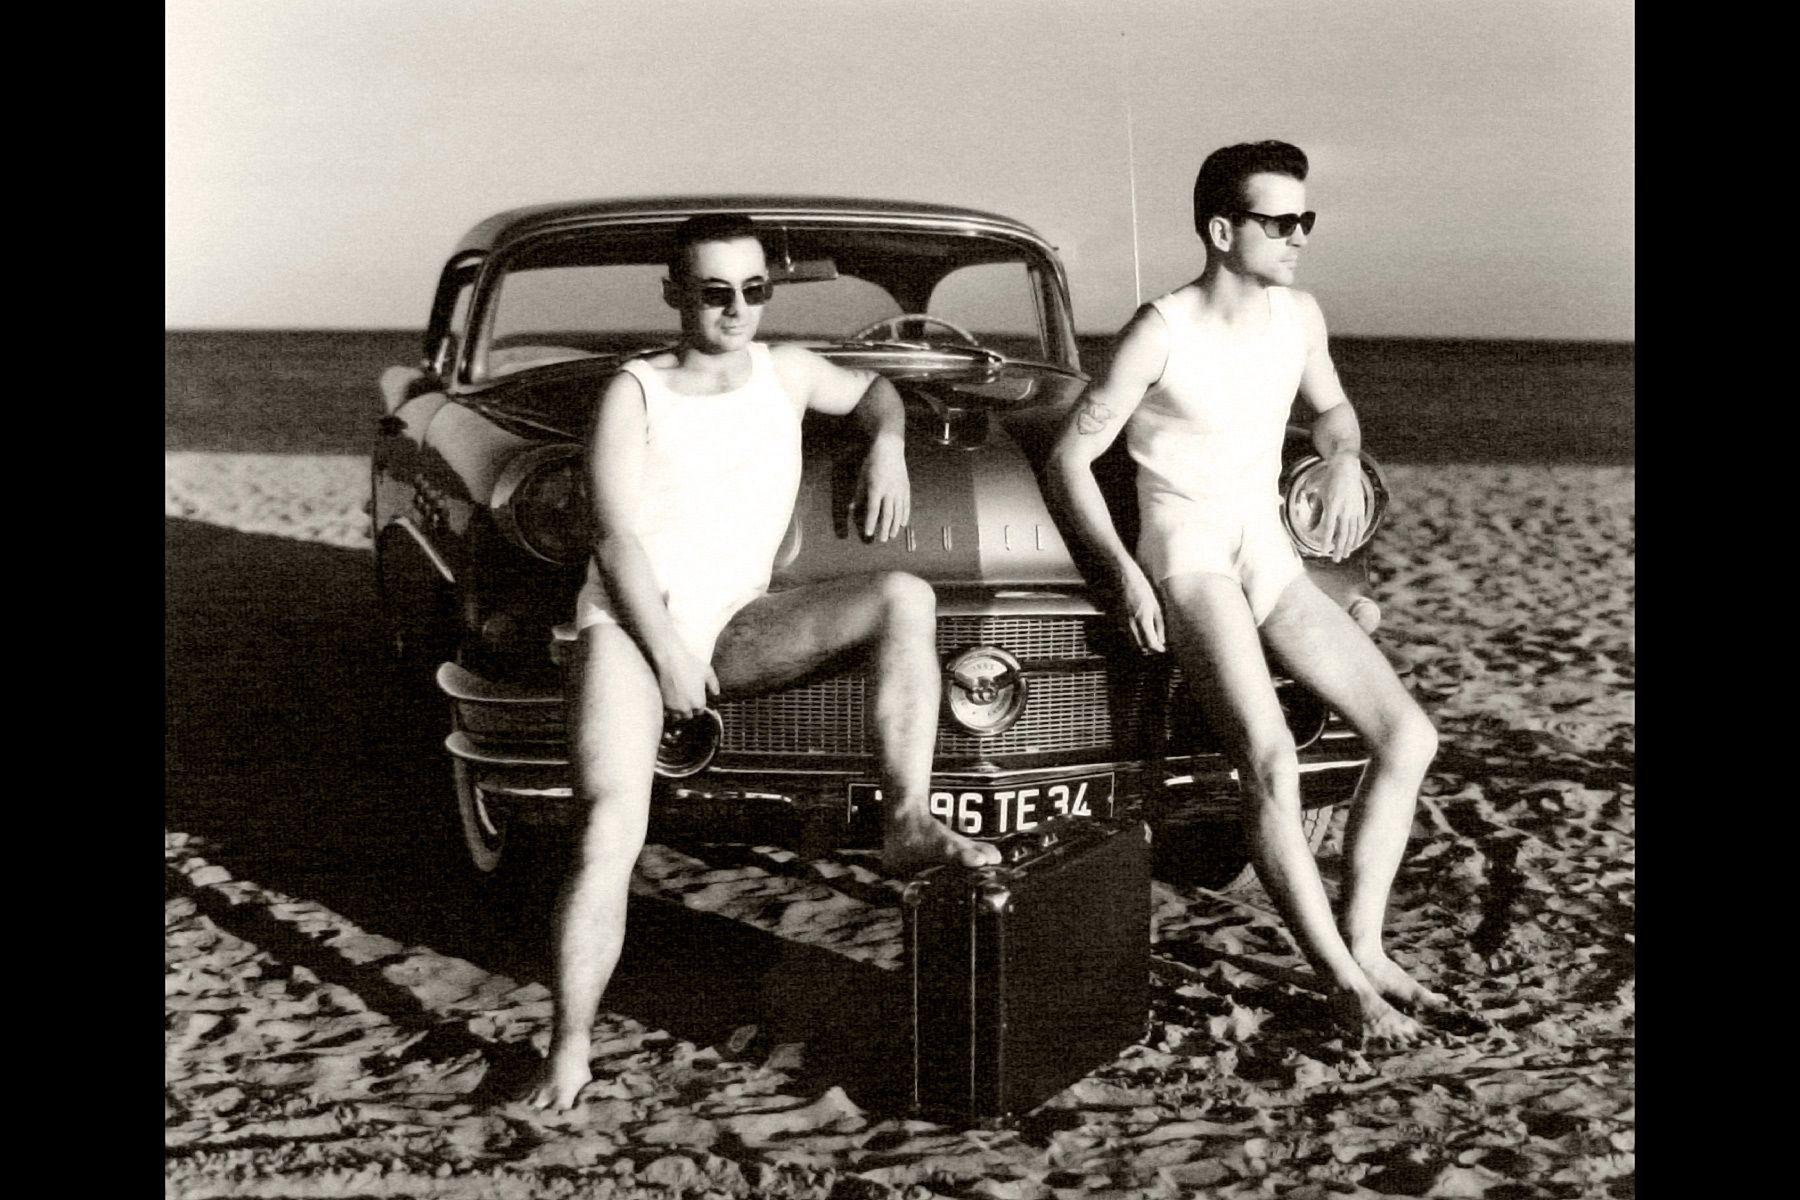 Bene and Christian on The Beach Buick 56 Serignan France